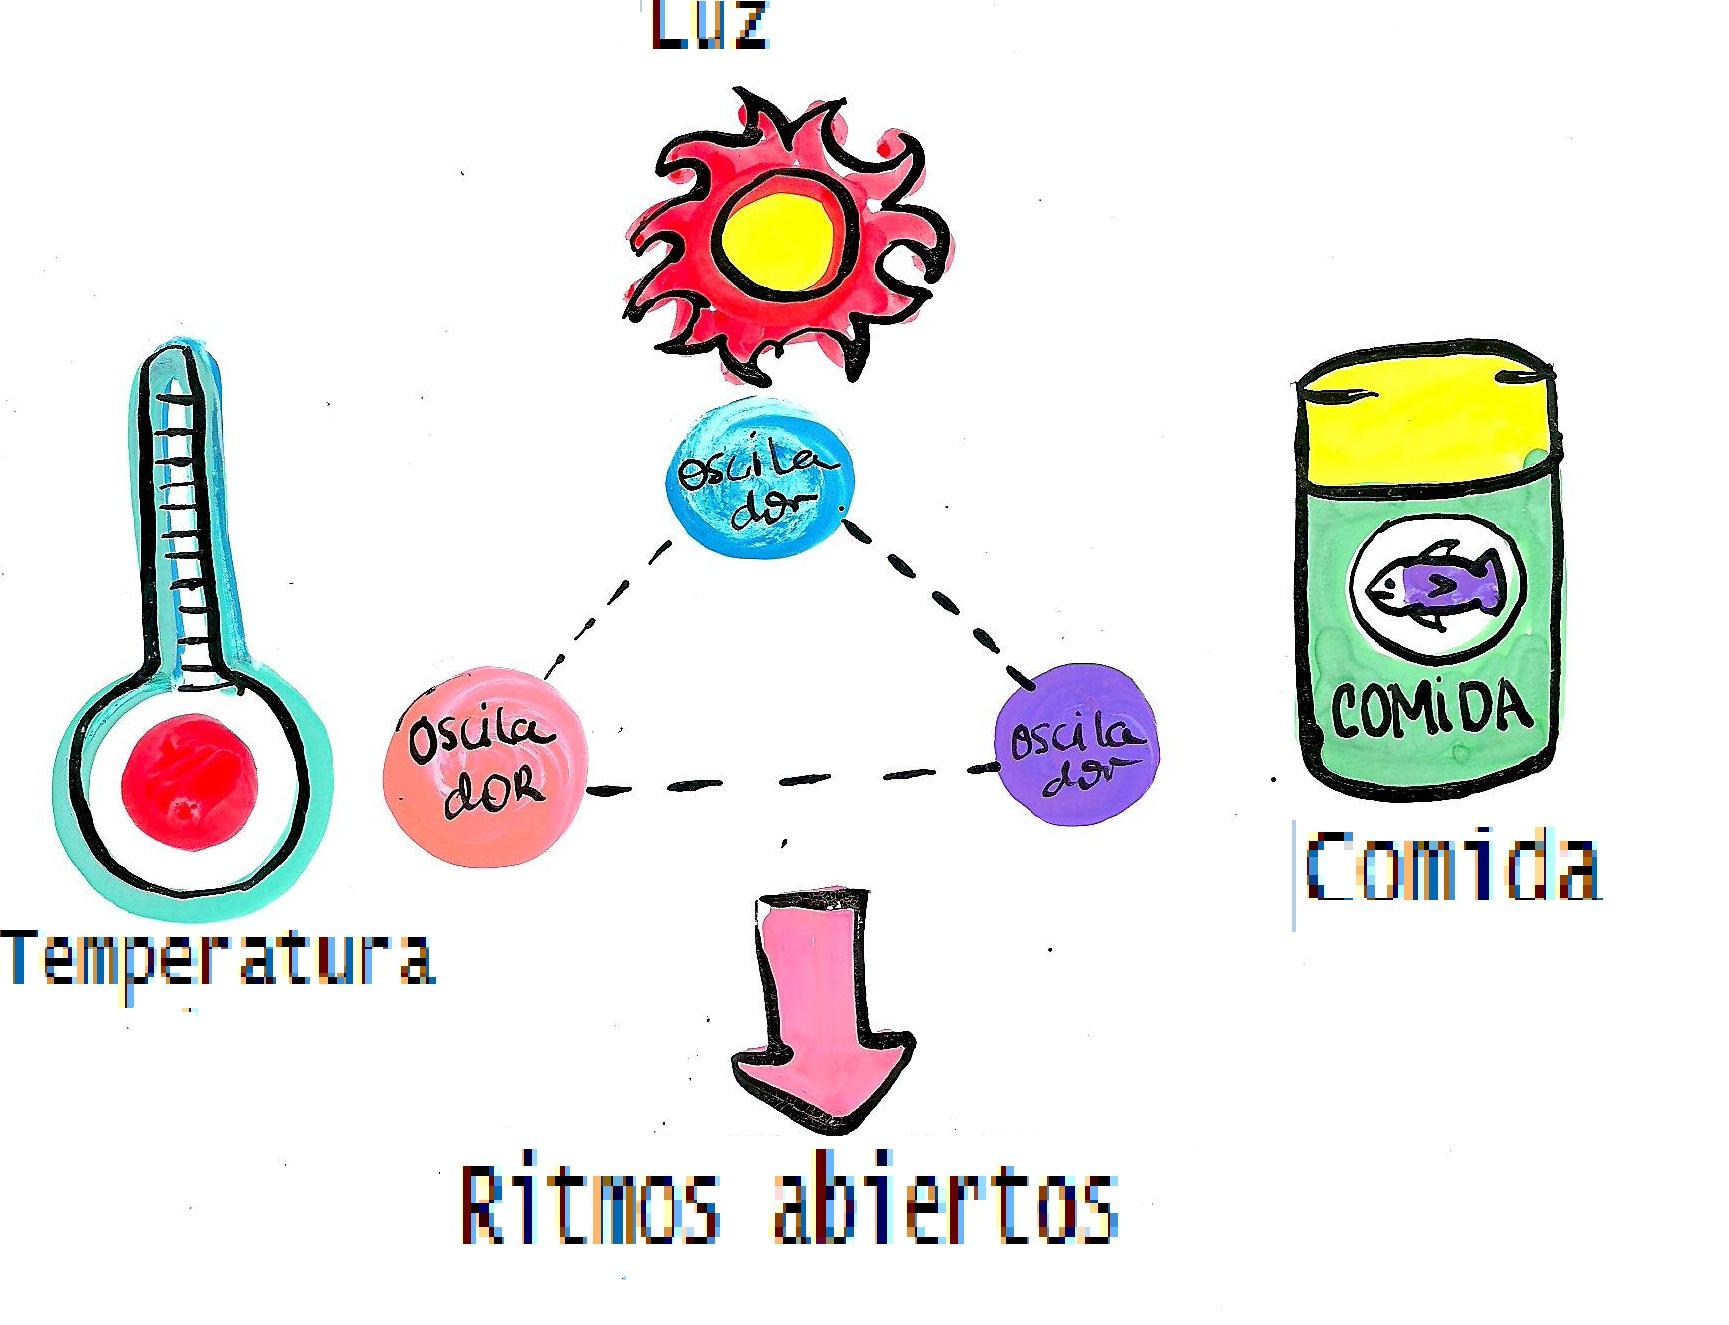 Factores que afectan ós ciclos circadianos.